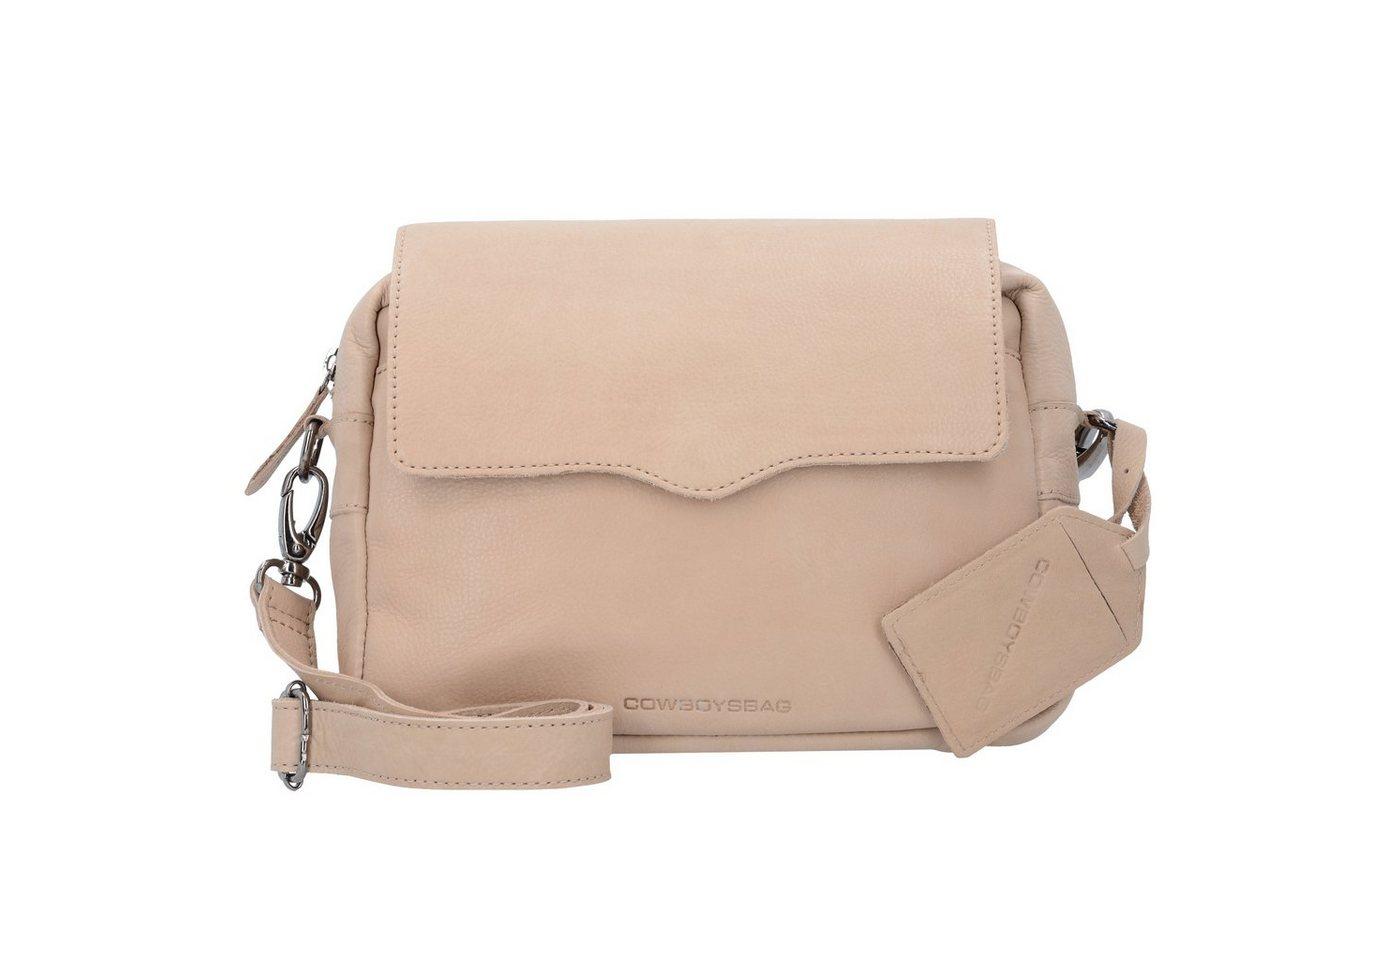 Damen Cowboysbag Joso Umhängetasche Leder 24 cm  | 08718586579927